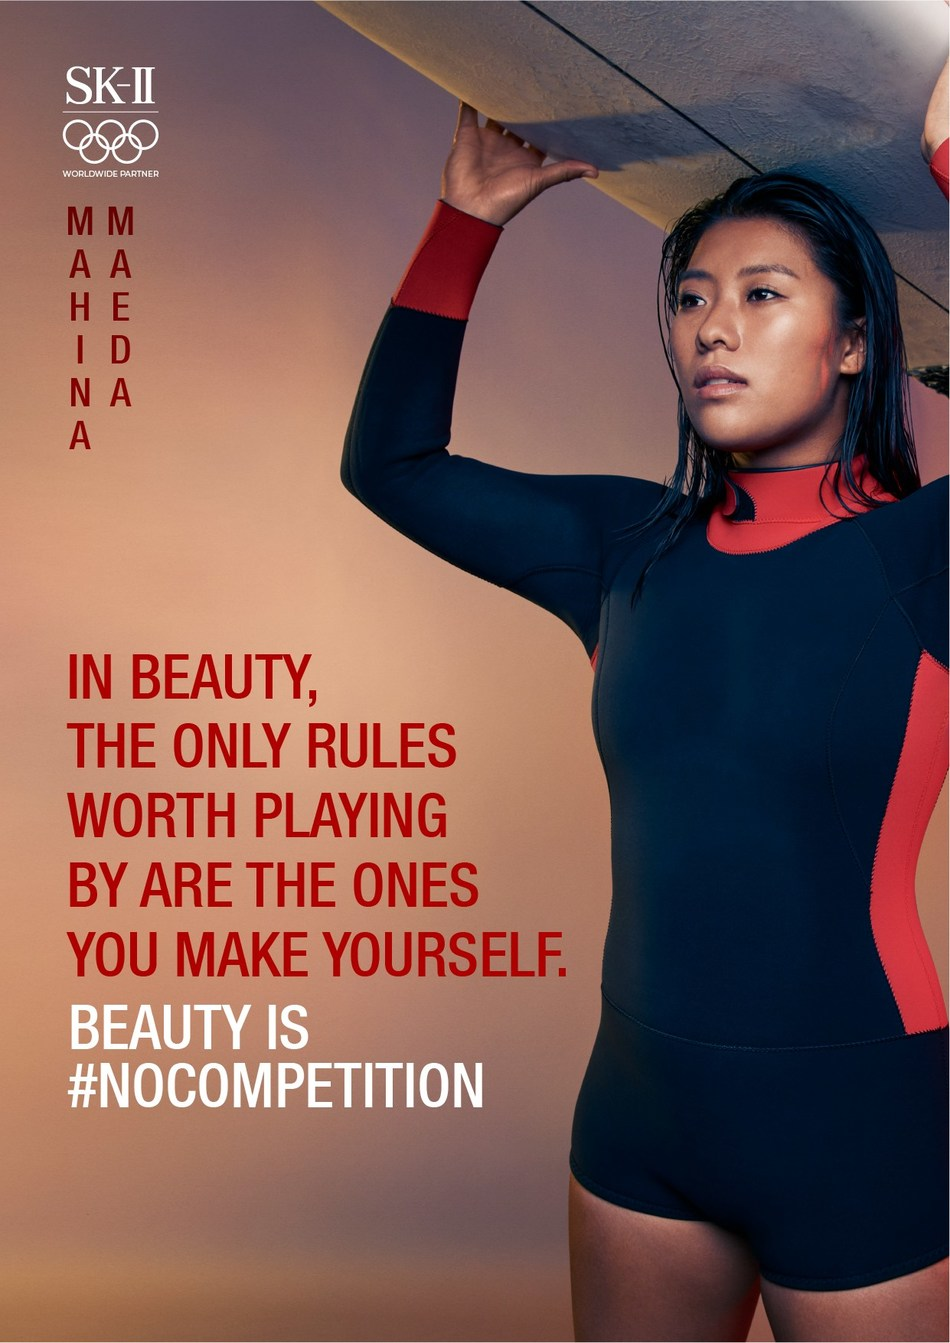 Mahina Maeda declares Beauty is #NOCOMPETITION